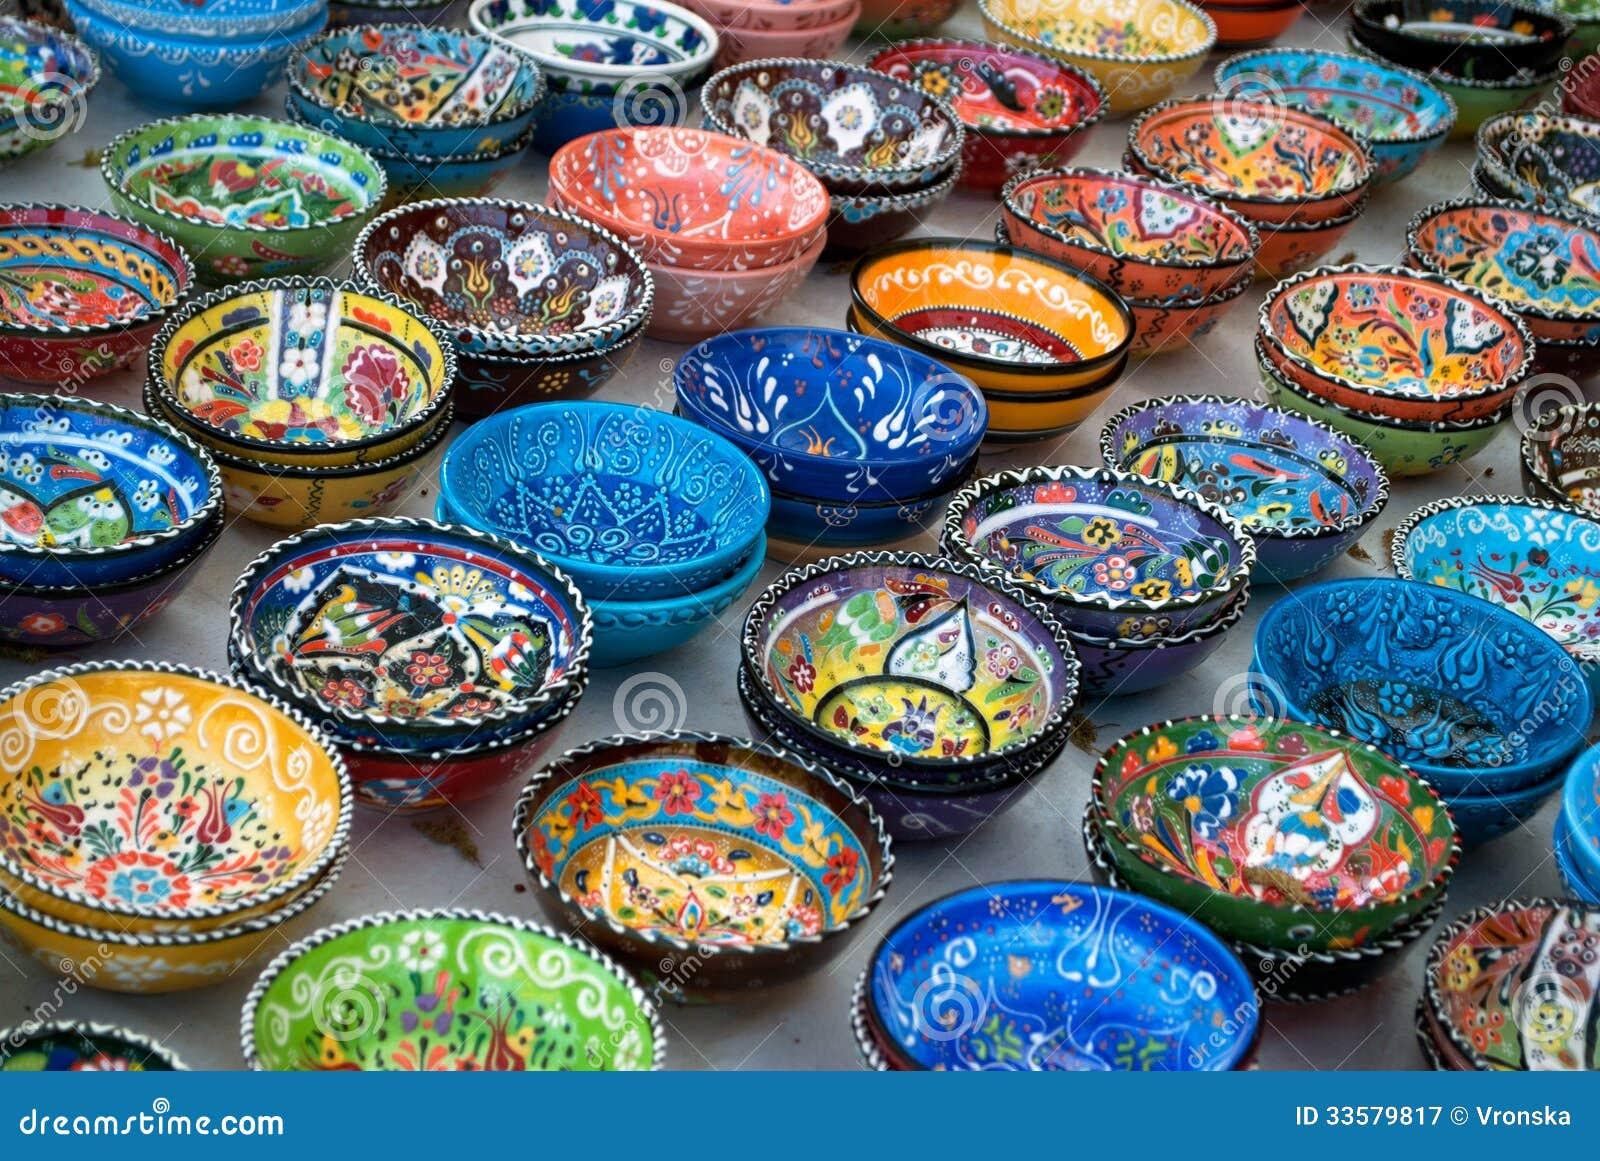 Turkish Ceramics Royalty Free Stock Photography Image